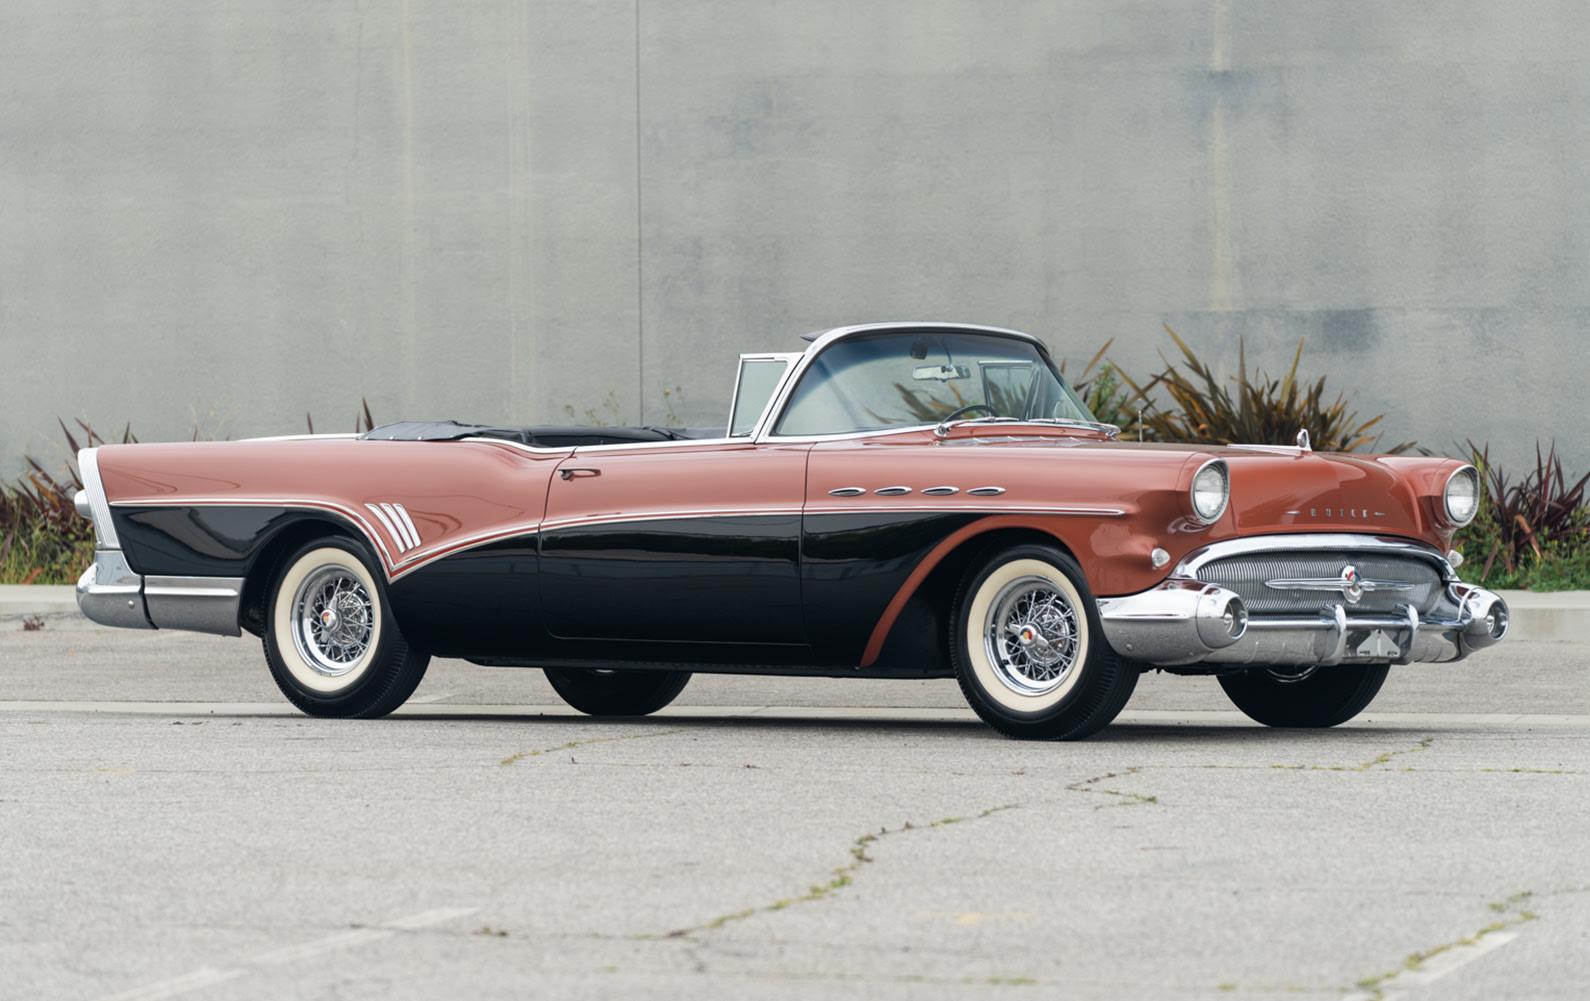 Prod/O21F - May 2021/1493_ 1957 Buick Roadmaster Covertible/1957_Buick_Roadmaster_Conv-12_JPEG_Press_icjmu8